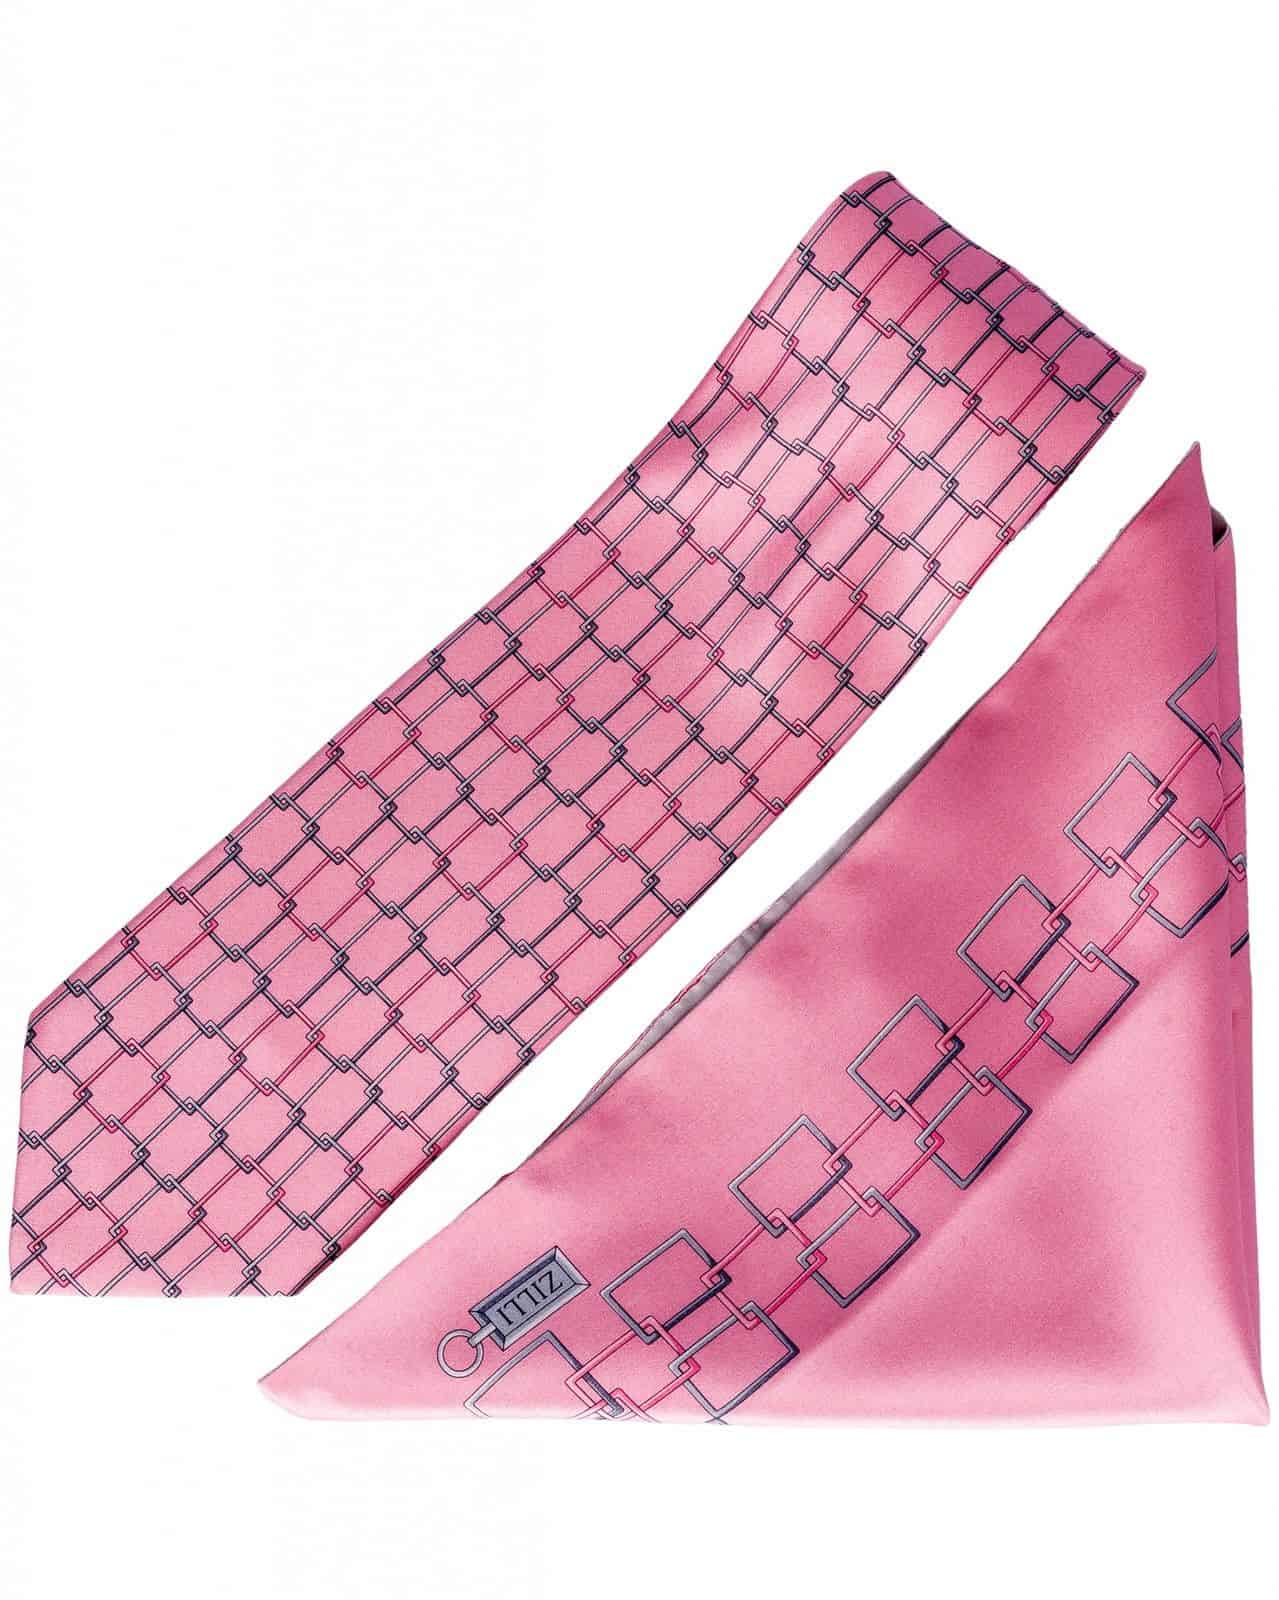 ZILLI – 100% Silk Tie & Pocket Square Set Pink 4881V08